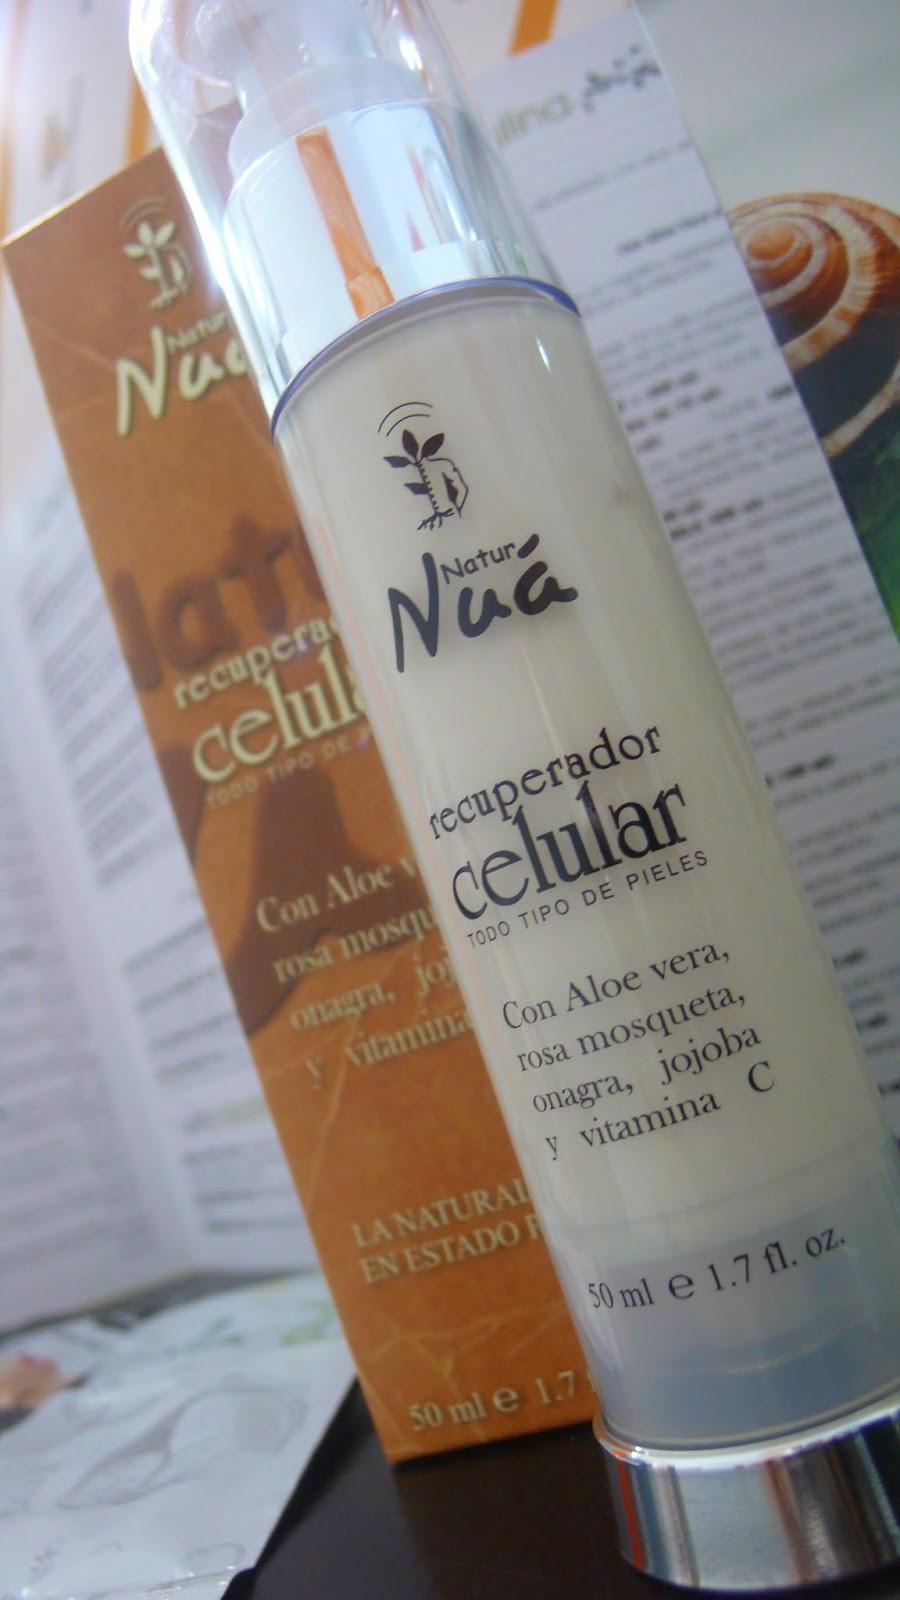 www.naturnua.com